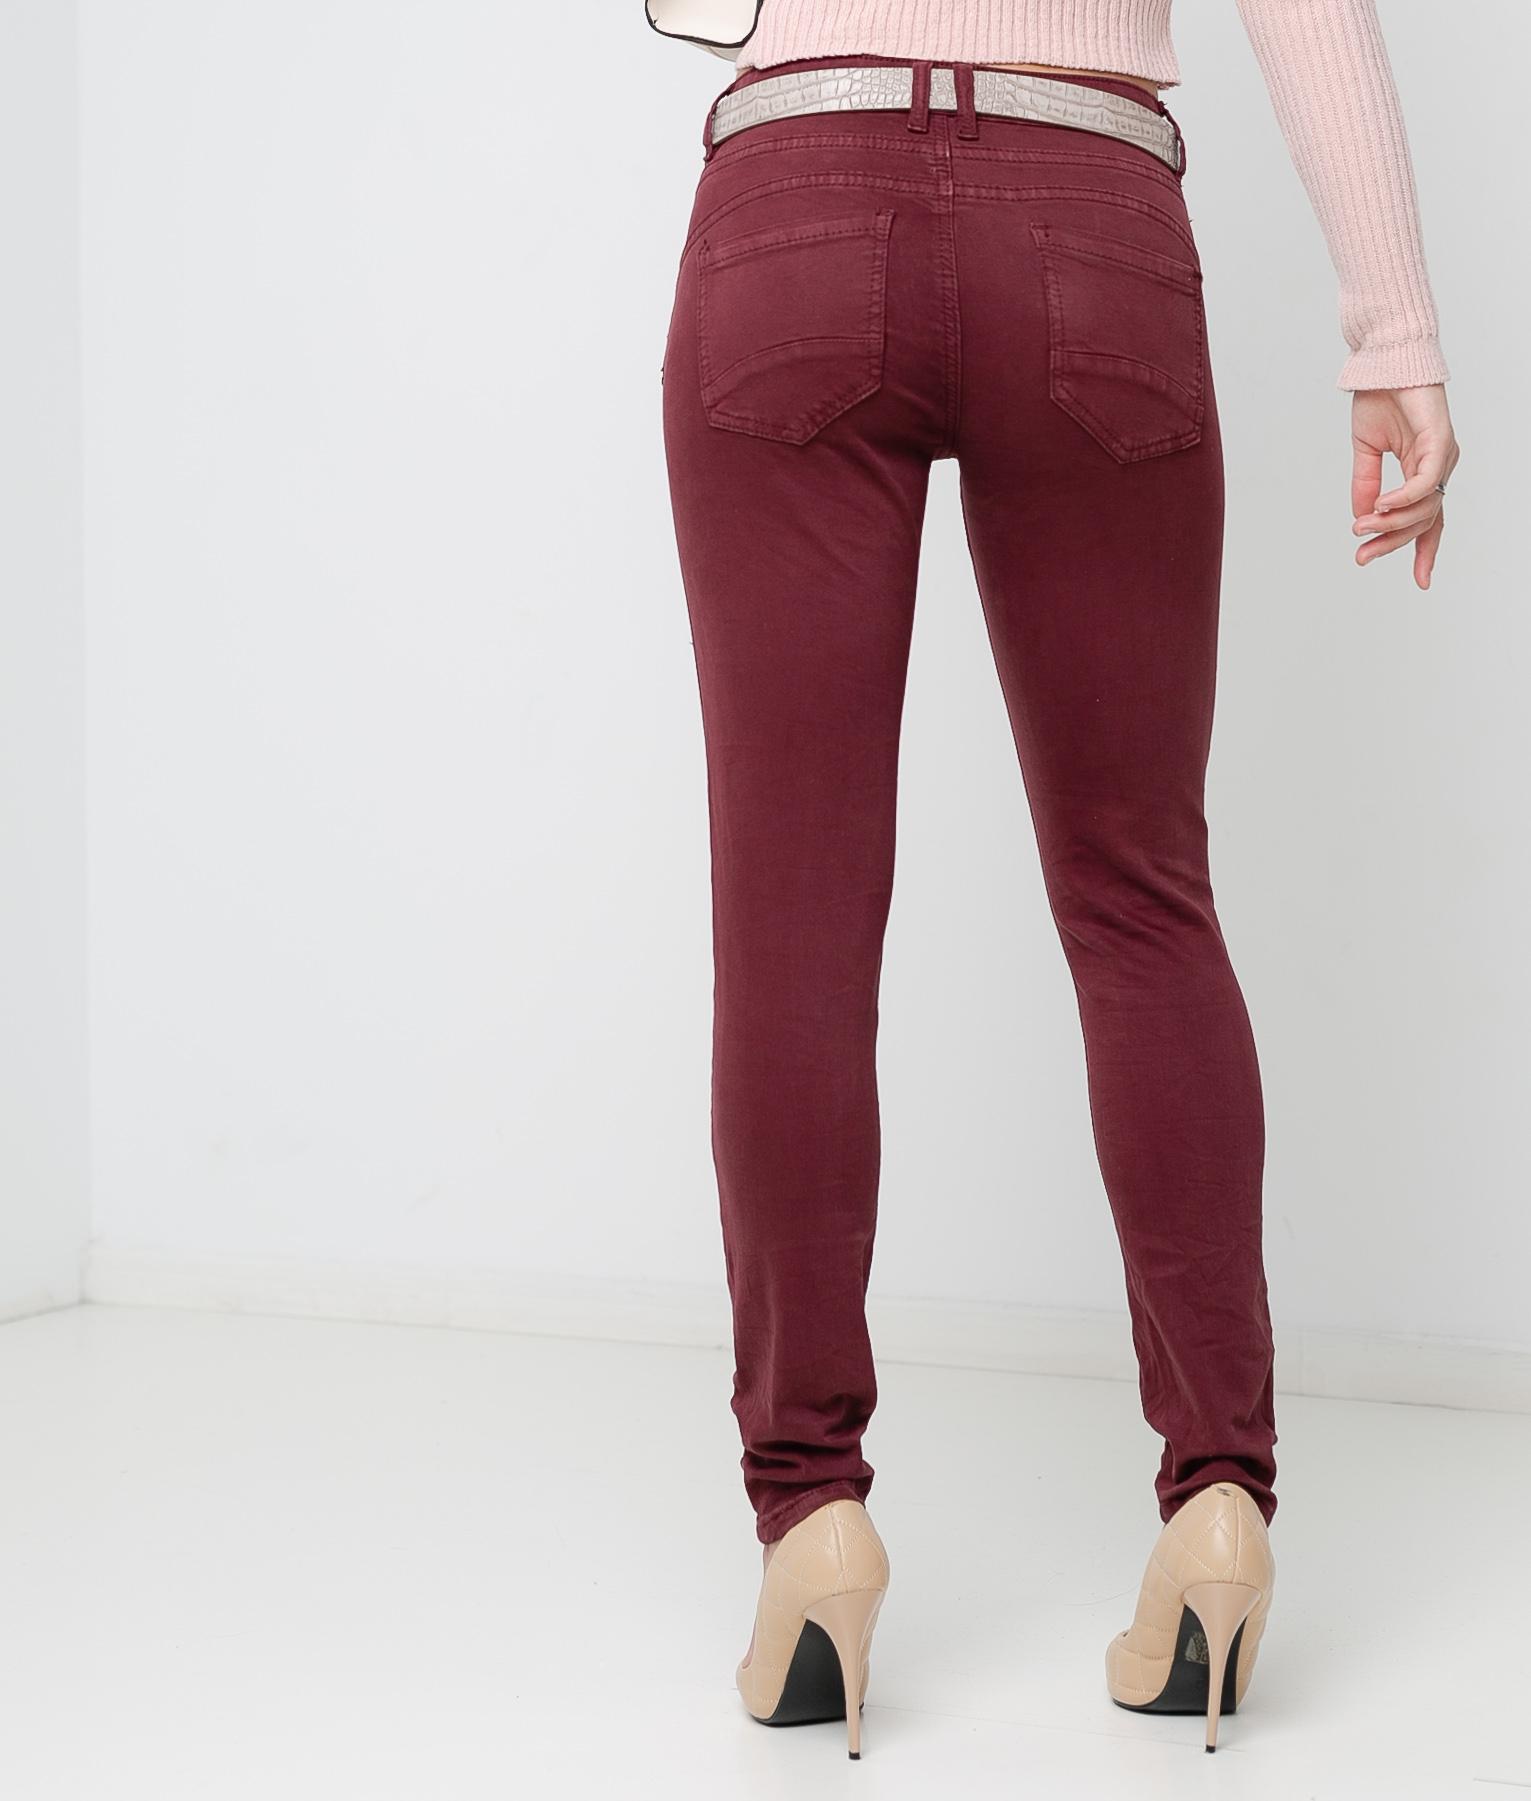 Pantalon Mainer - Grenat